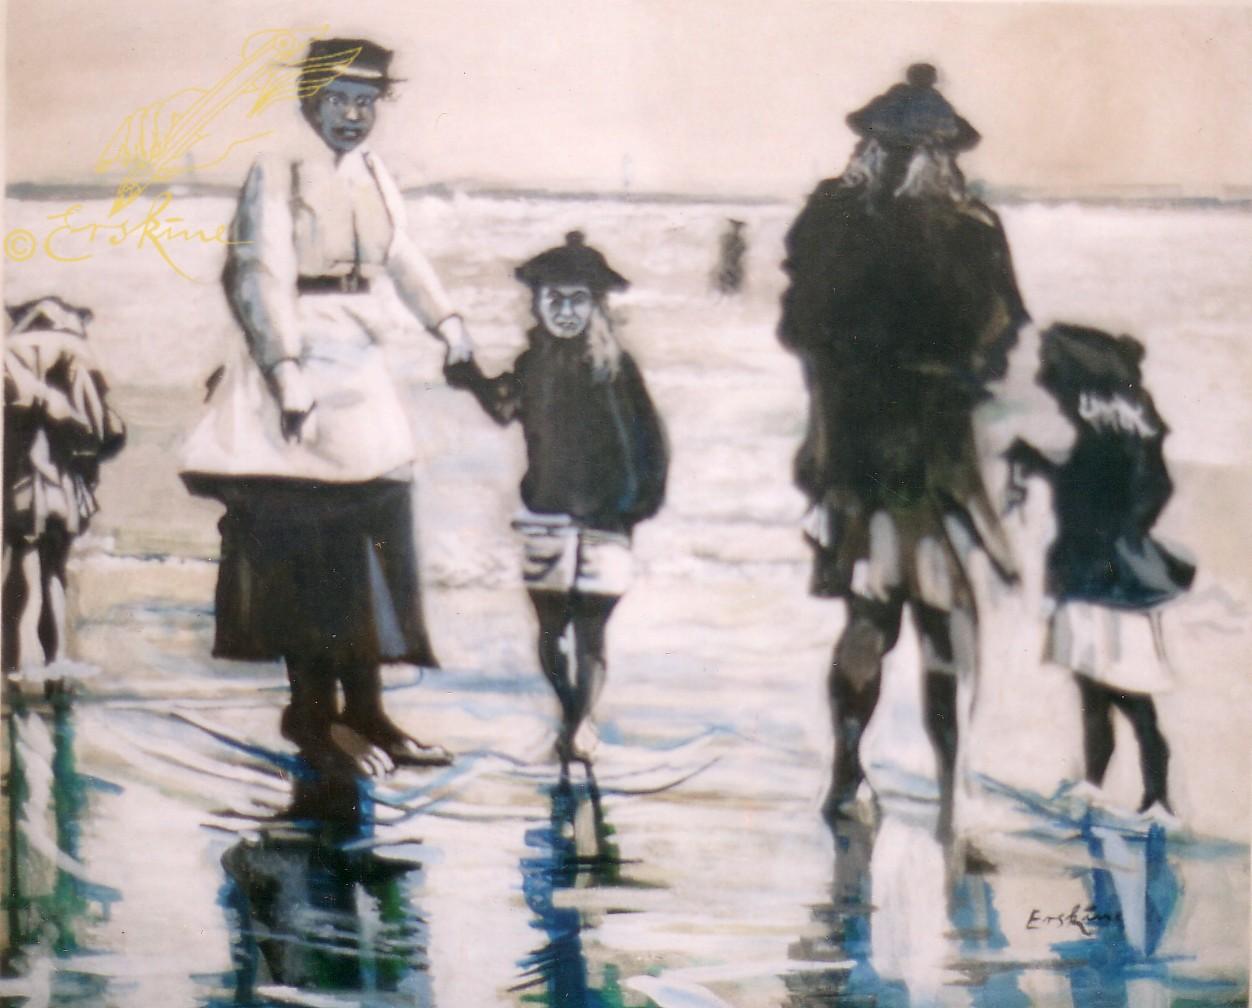 Wet feet, oil on canvas, 1.4x1.2m